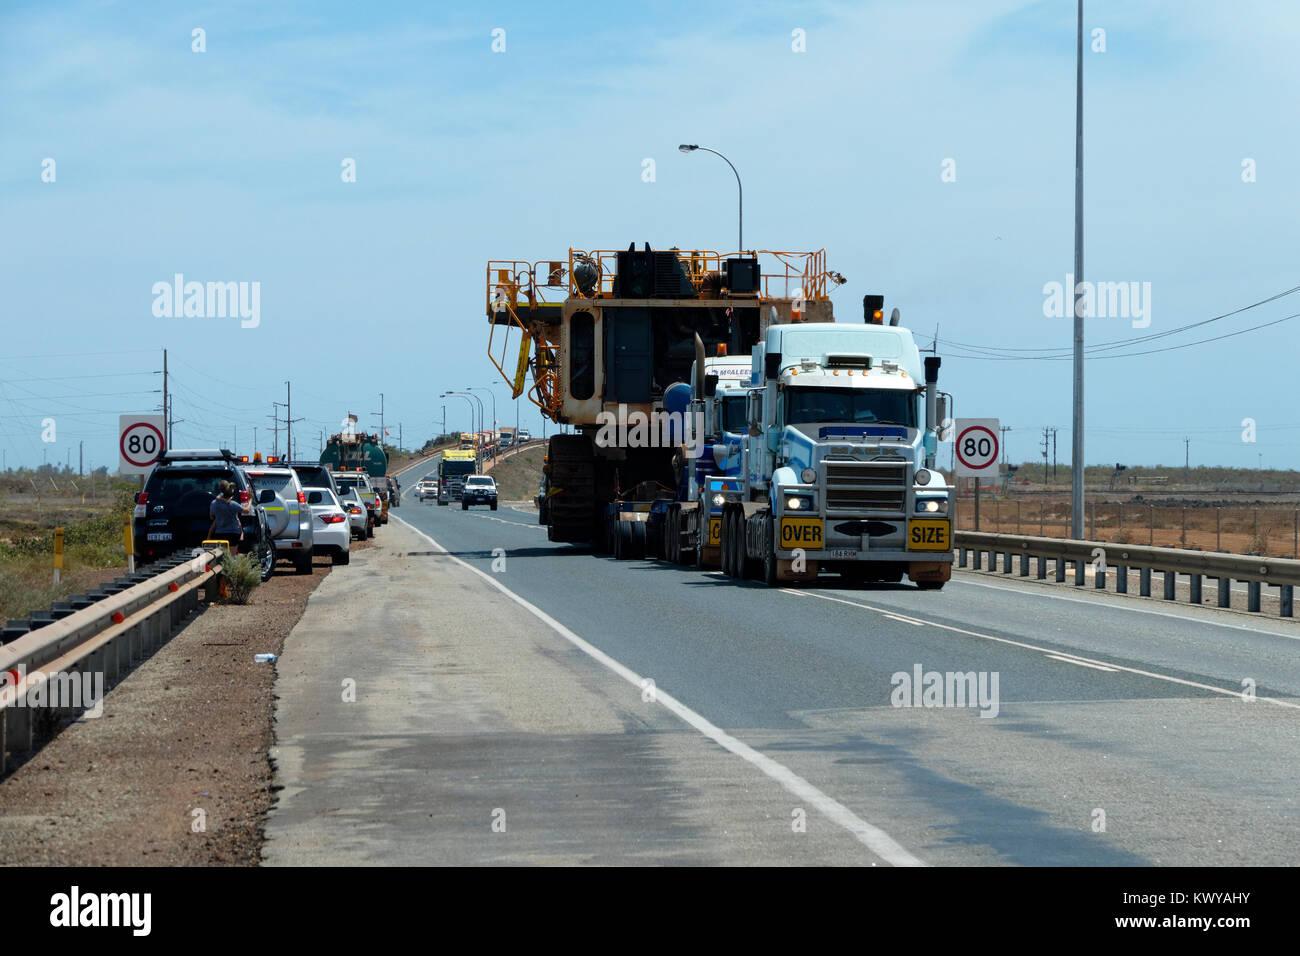 Oversize load being transported by 2 prime mover trucks, Port Hedland, Western Australia - Stock Image